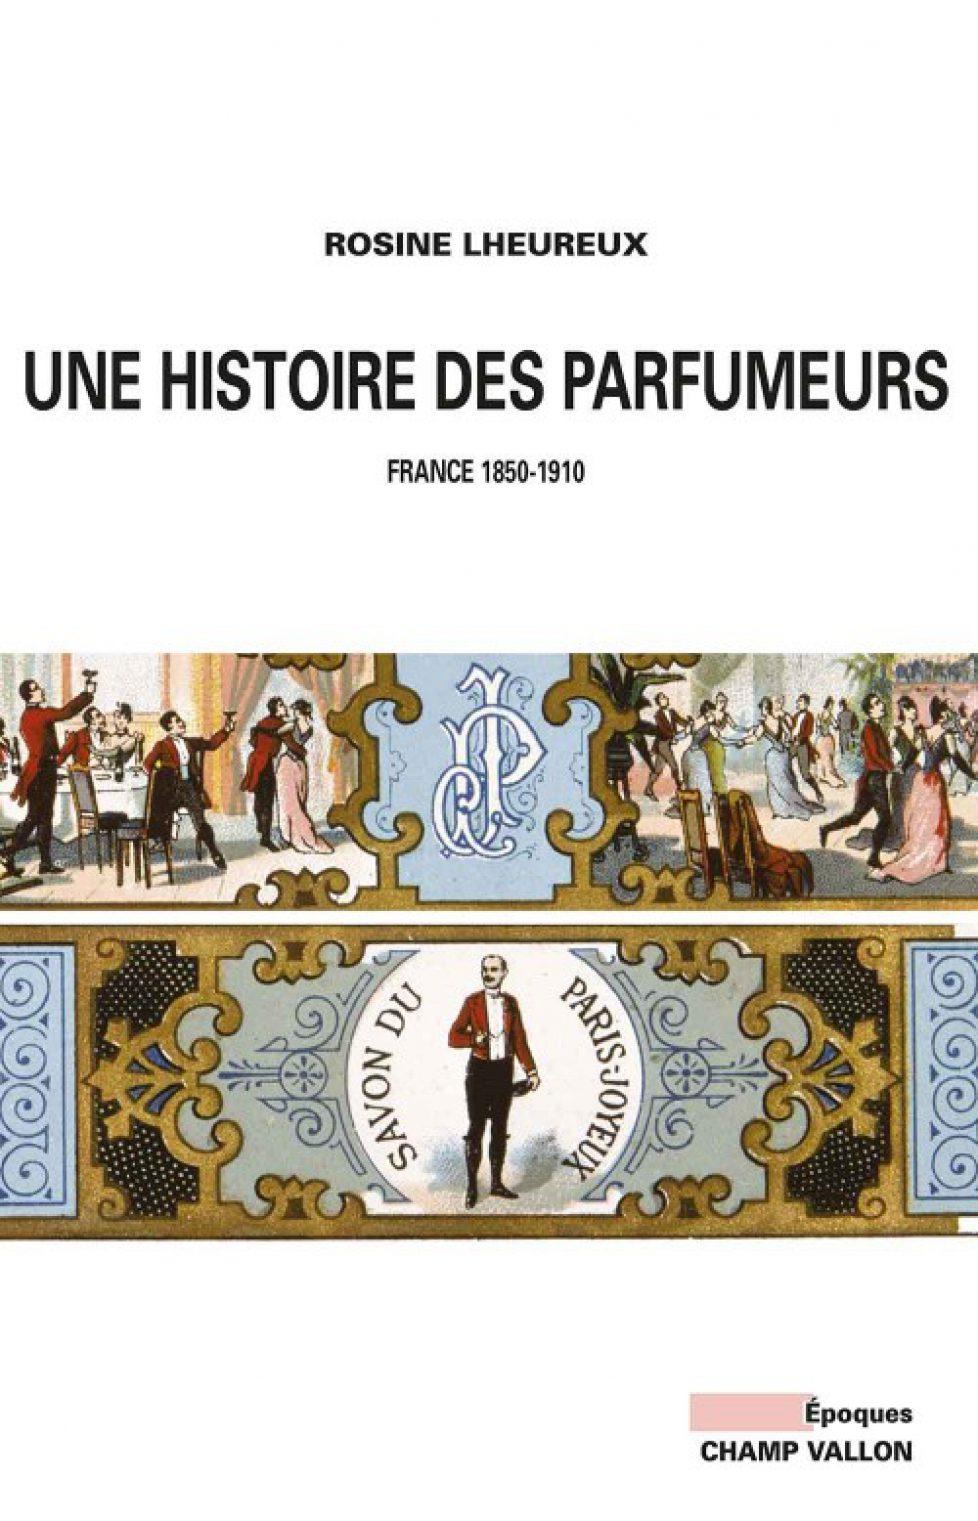 xcouv-parfumeurs-500x778_jpg_pagespeed_ic_T3Vtmb-LfG